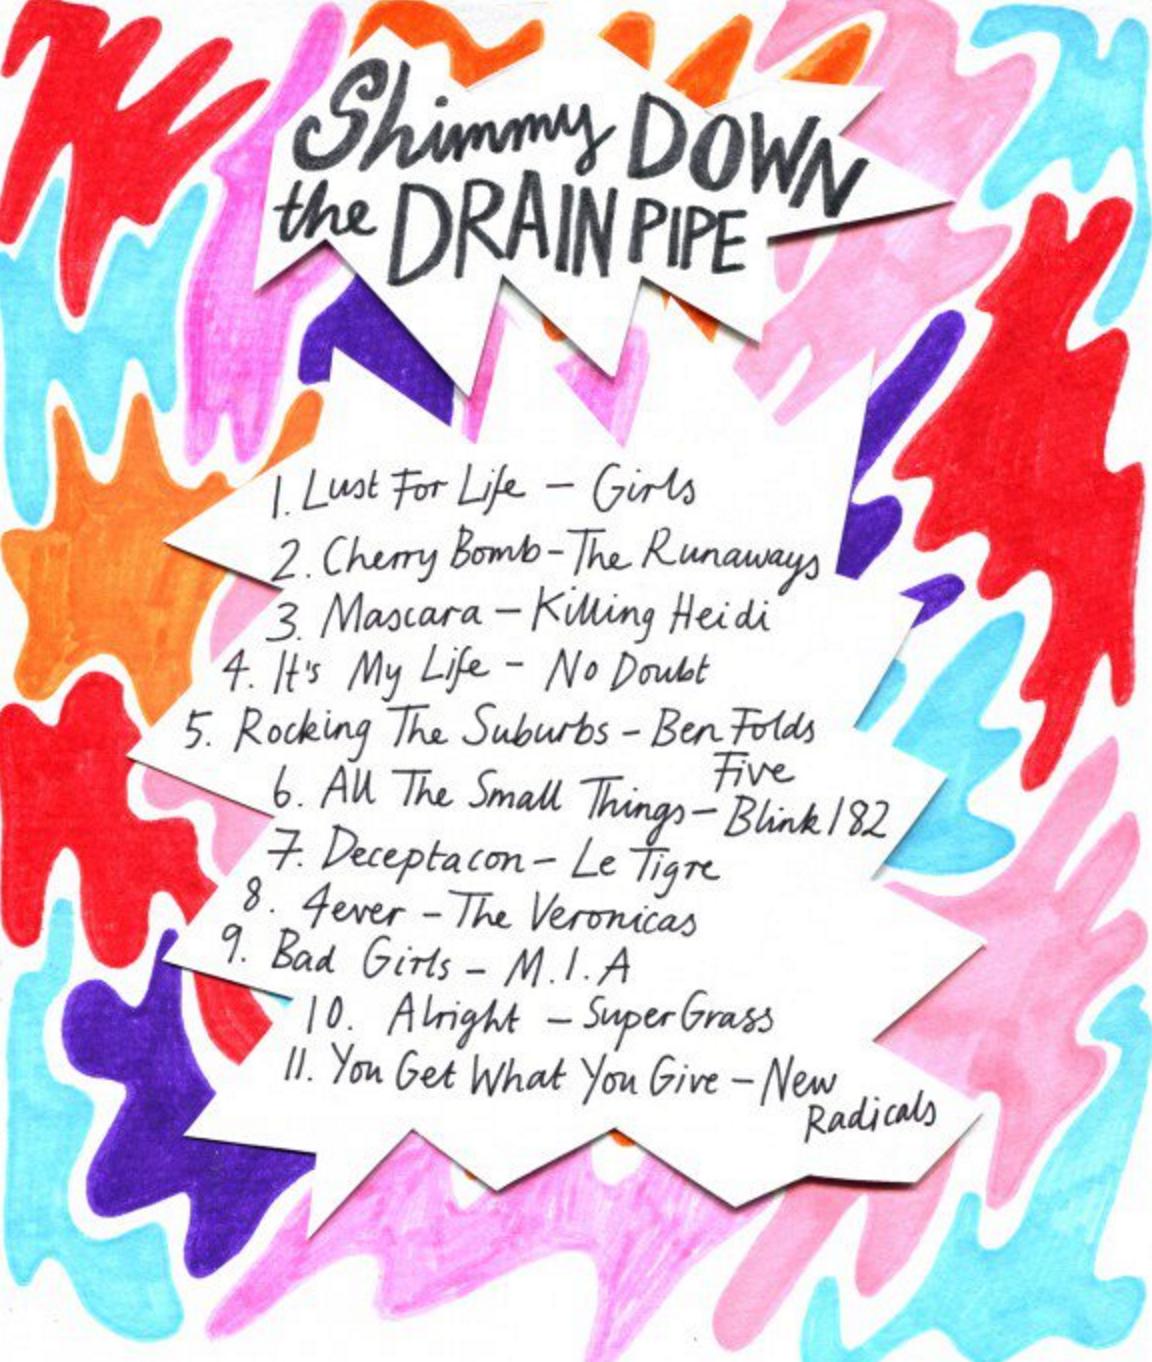 Friday Playlist 08/30/2013 Minna Gillgan,rookiemag